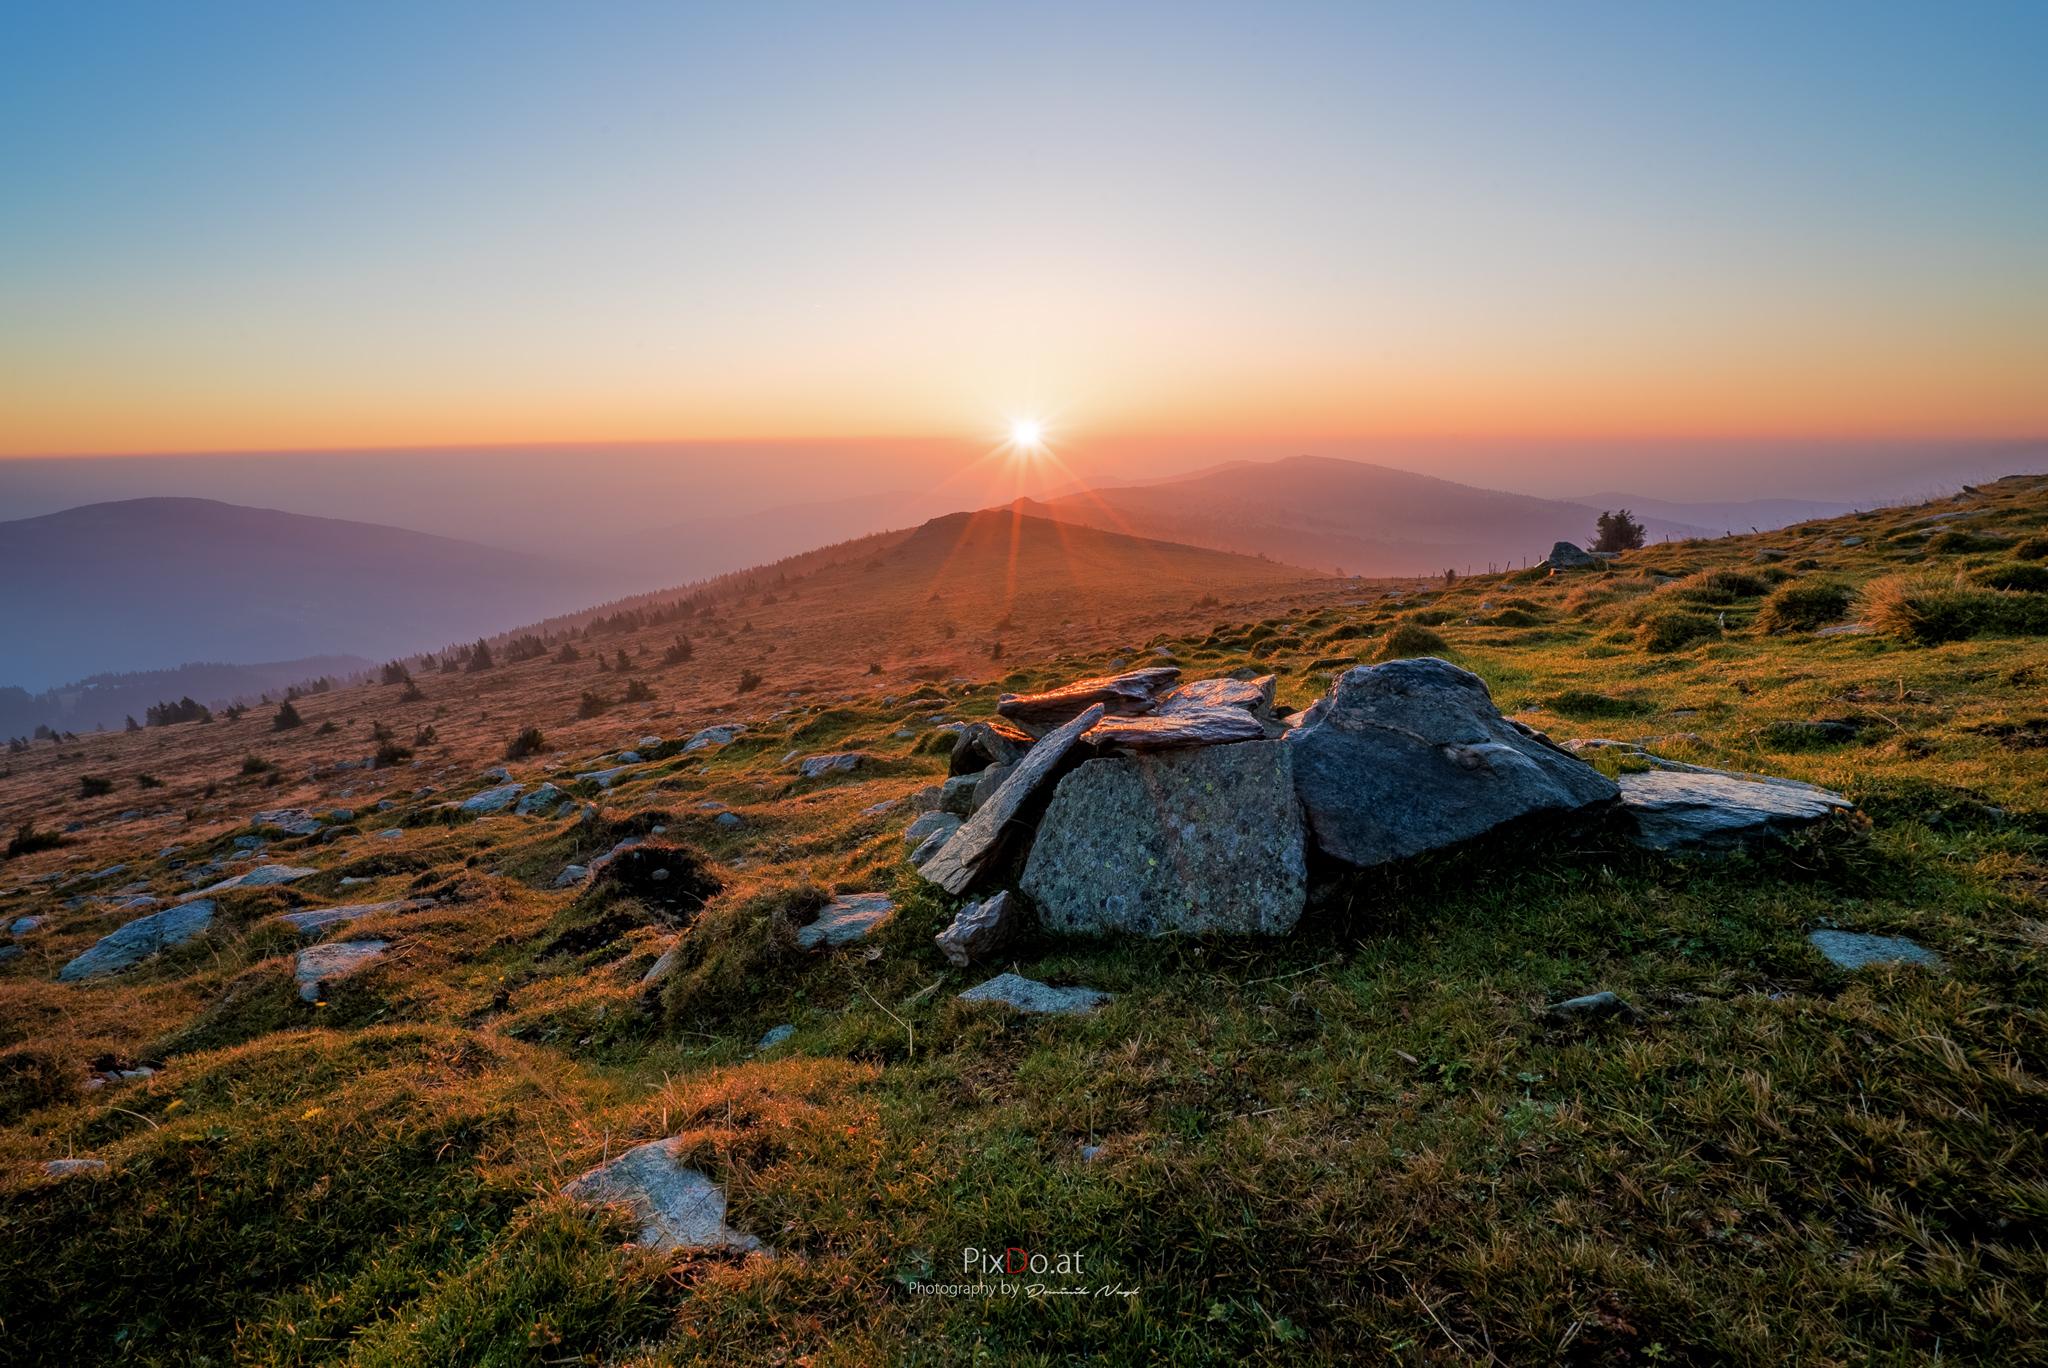 Sonnenaufgang Hochwechsel Herbst